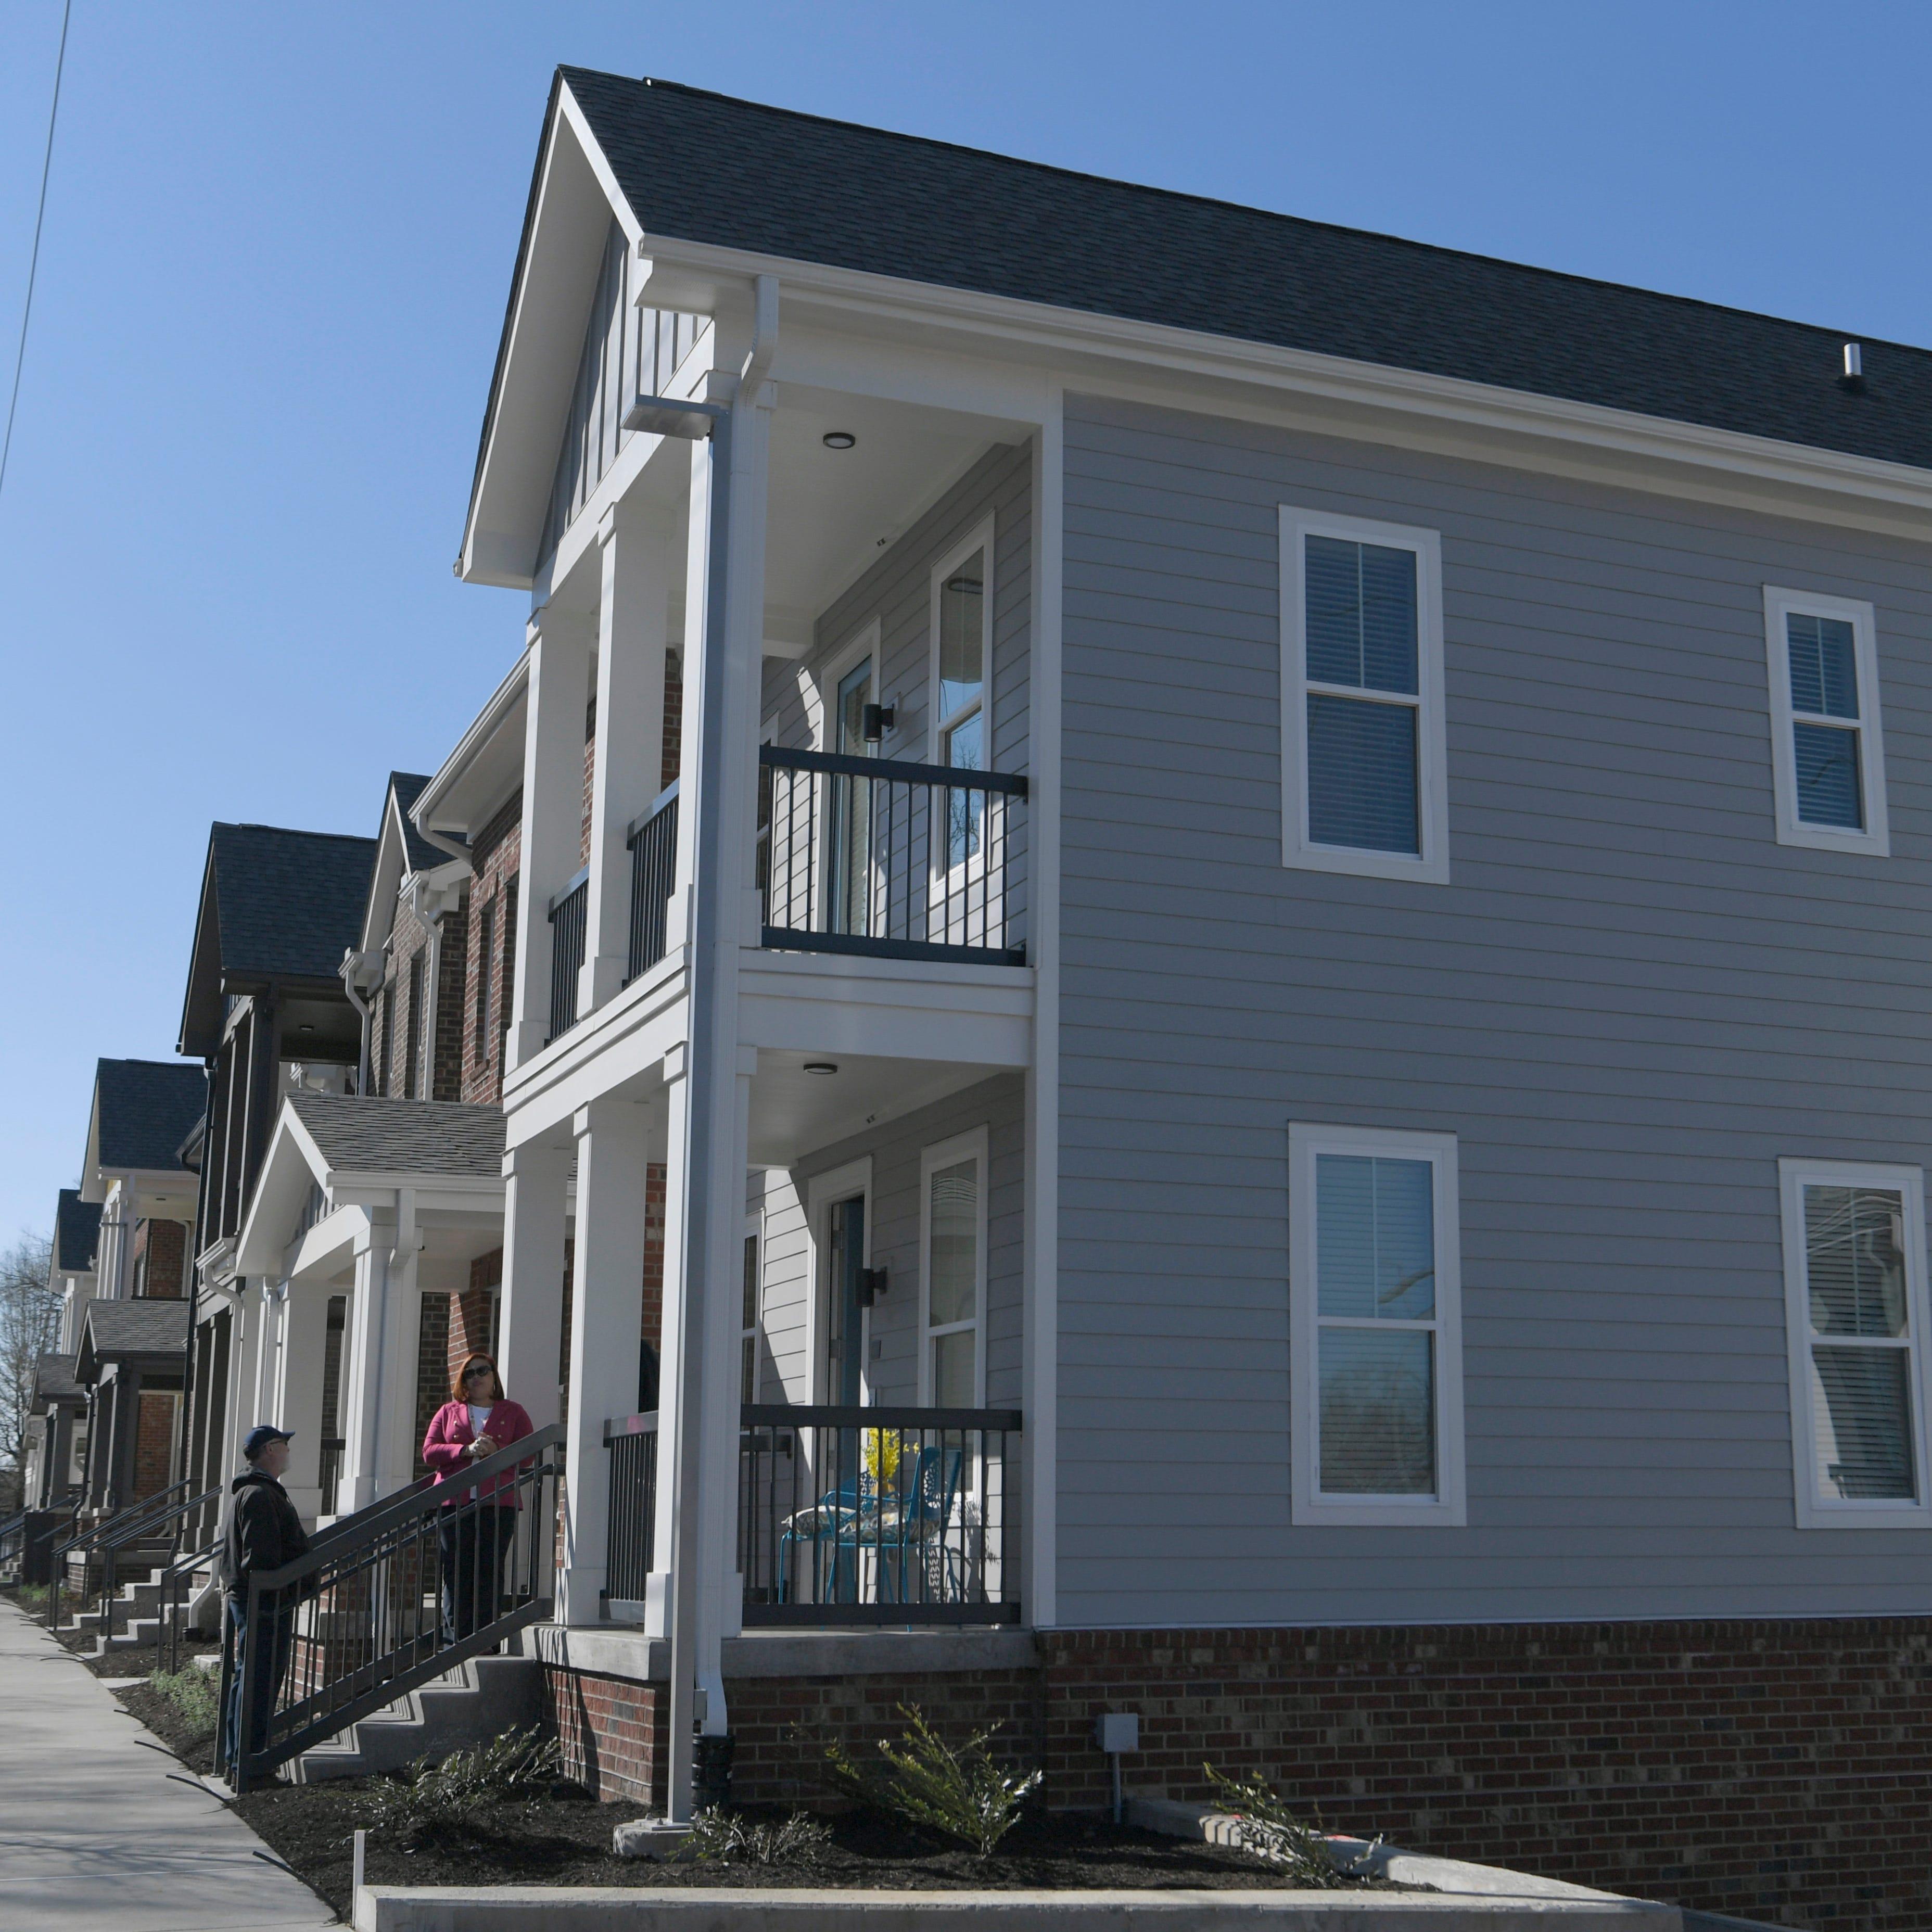 Nashville Mayor David Briley announces $500M affordable housing push